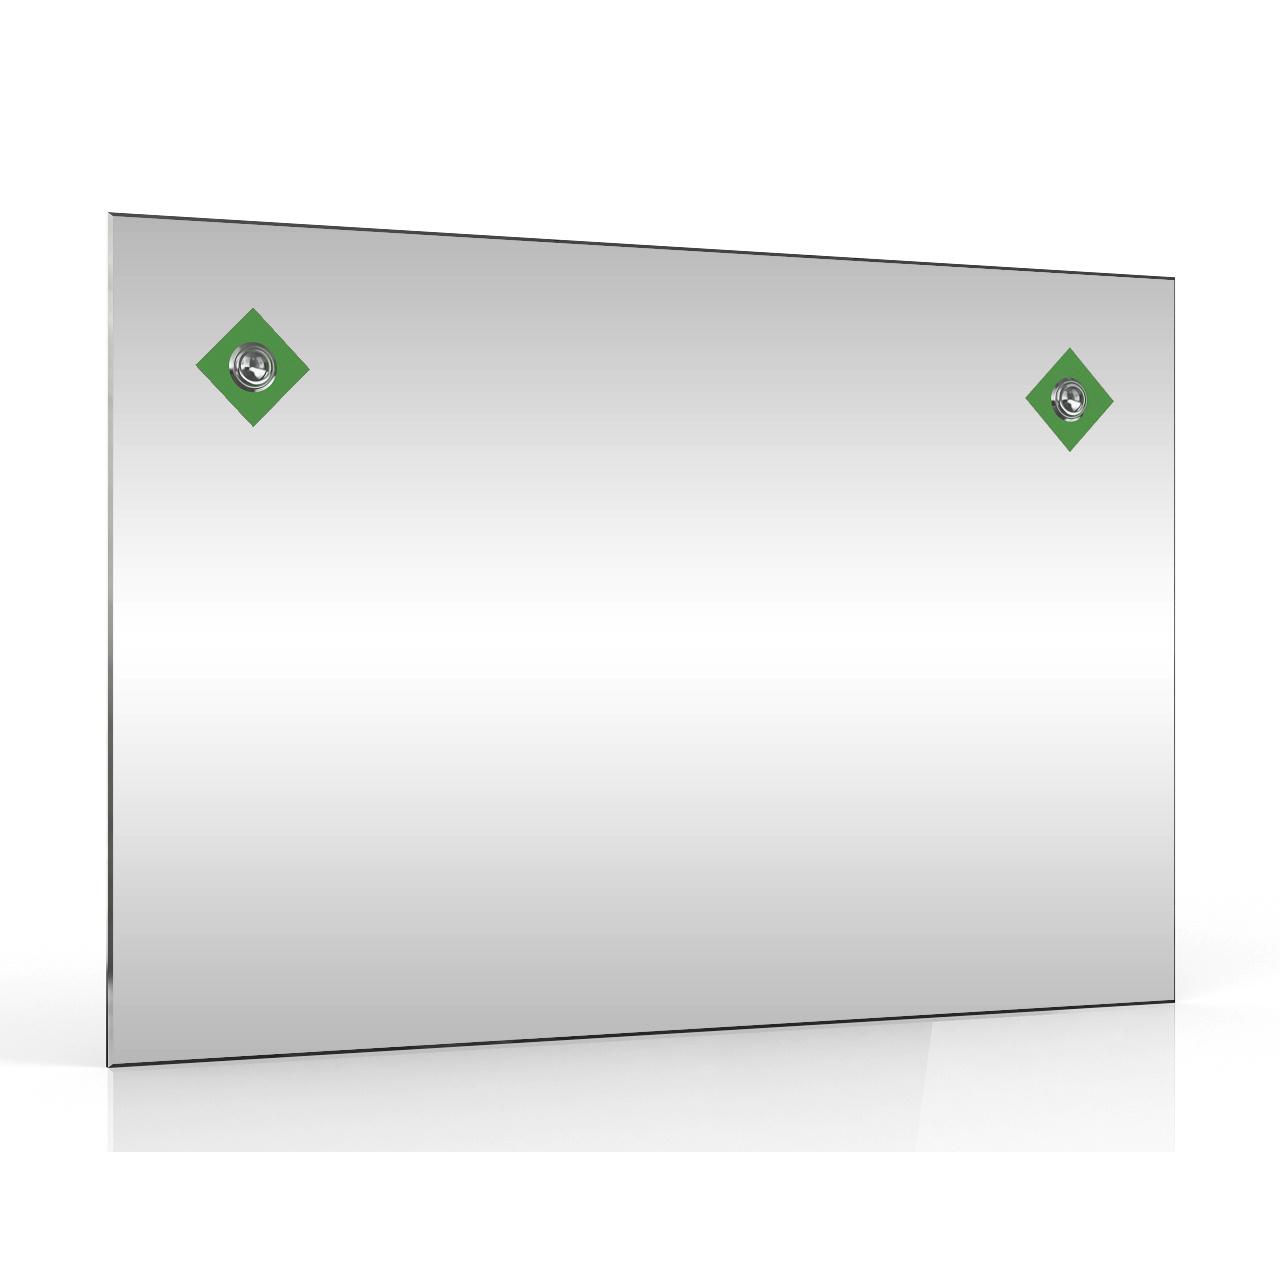 Зеркало ЕвроЗеркало 401С 2Г зелёный, 60х40 см.,